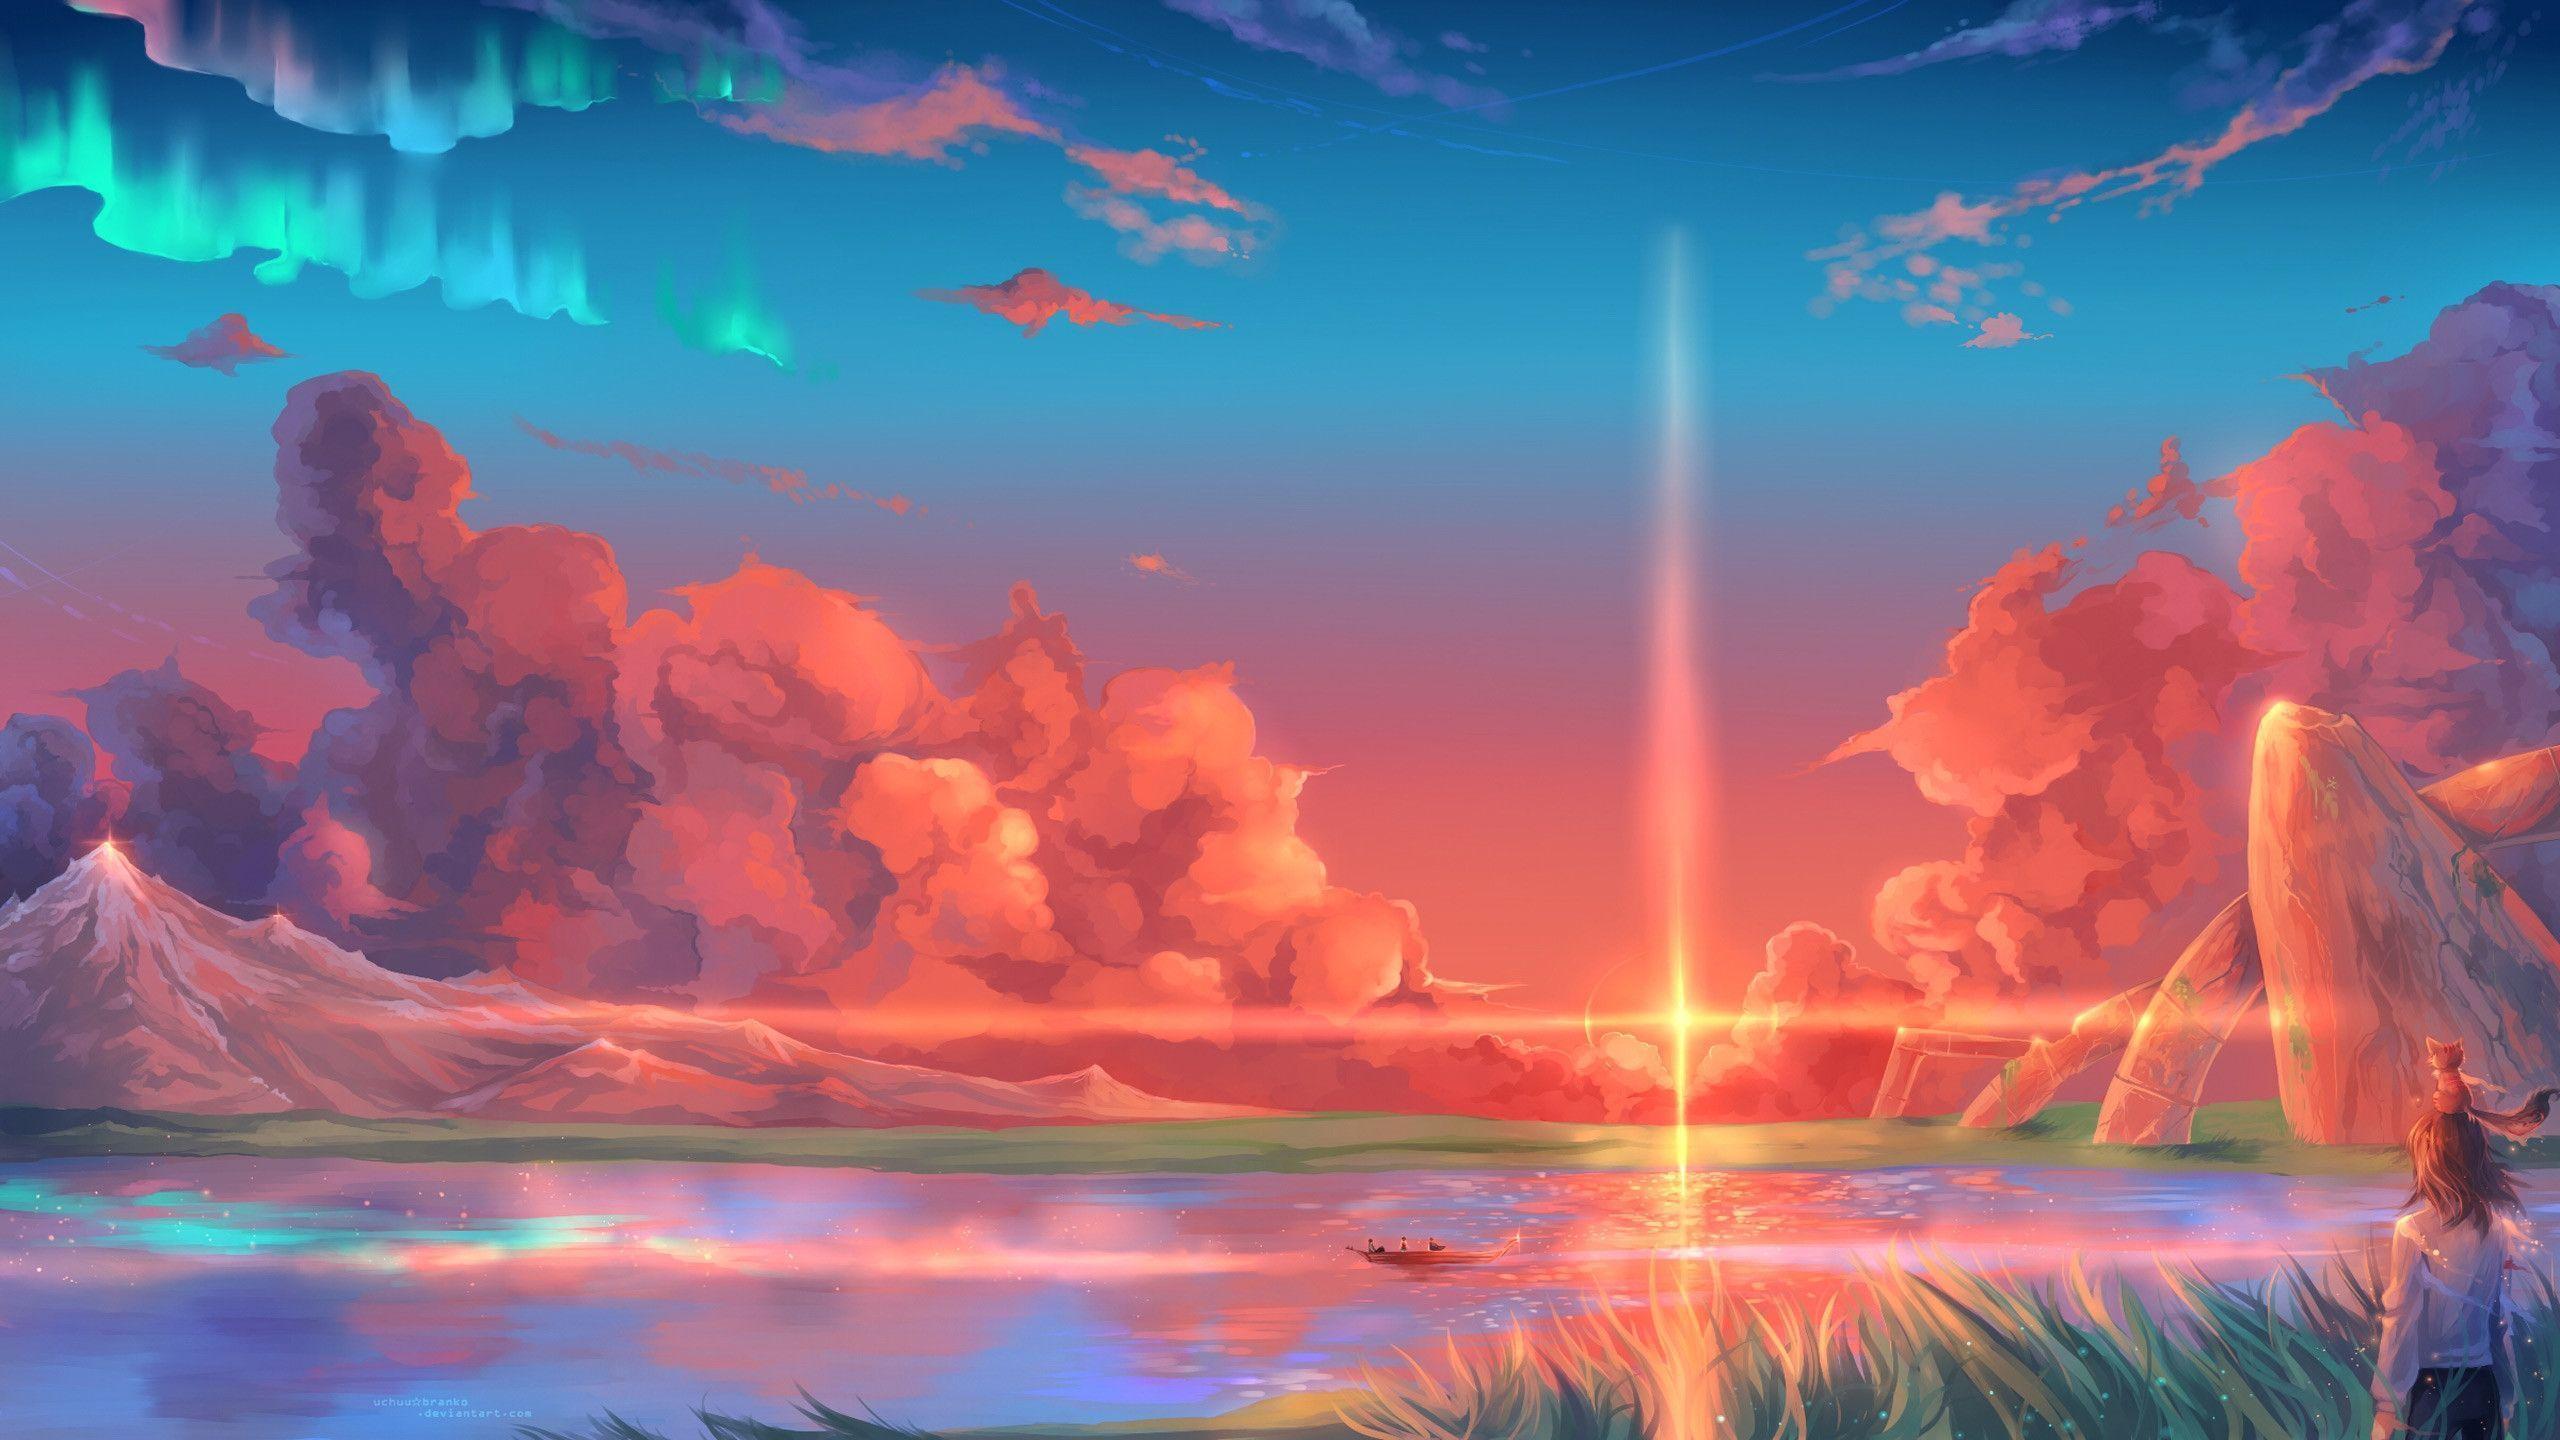 Morning Aesthetic Desktop Wallpapers Top Free Morning Aesthetic Desktop Backgrounds Wallpaperaccess